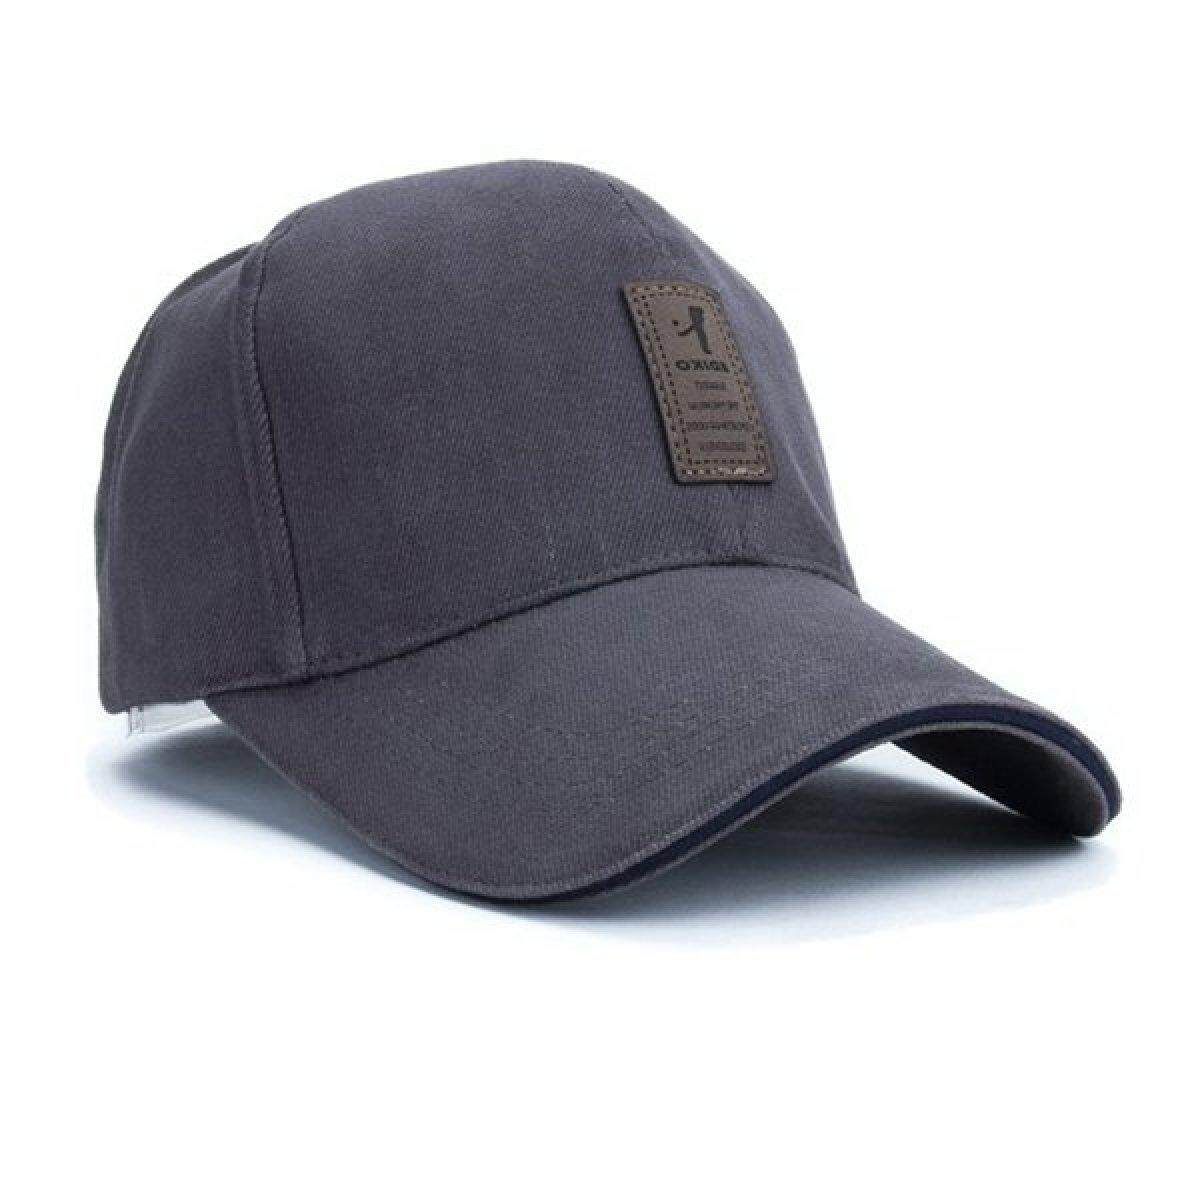 2018 Terbaik Jual Unisex Mode Topi Olahraga Bisbol Golf Snapback Outdoor  Sederhana Solid Topi (Abu dd7b8f5282